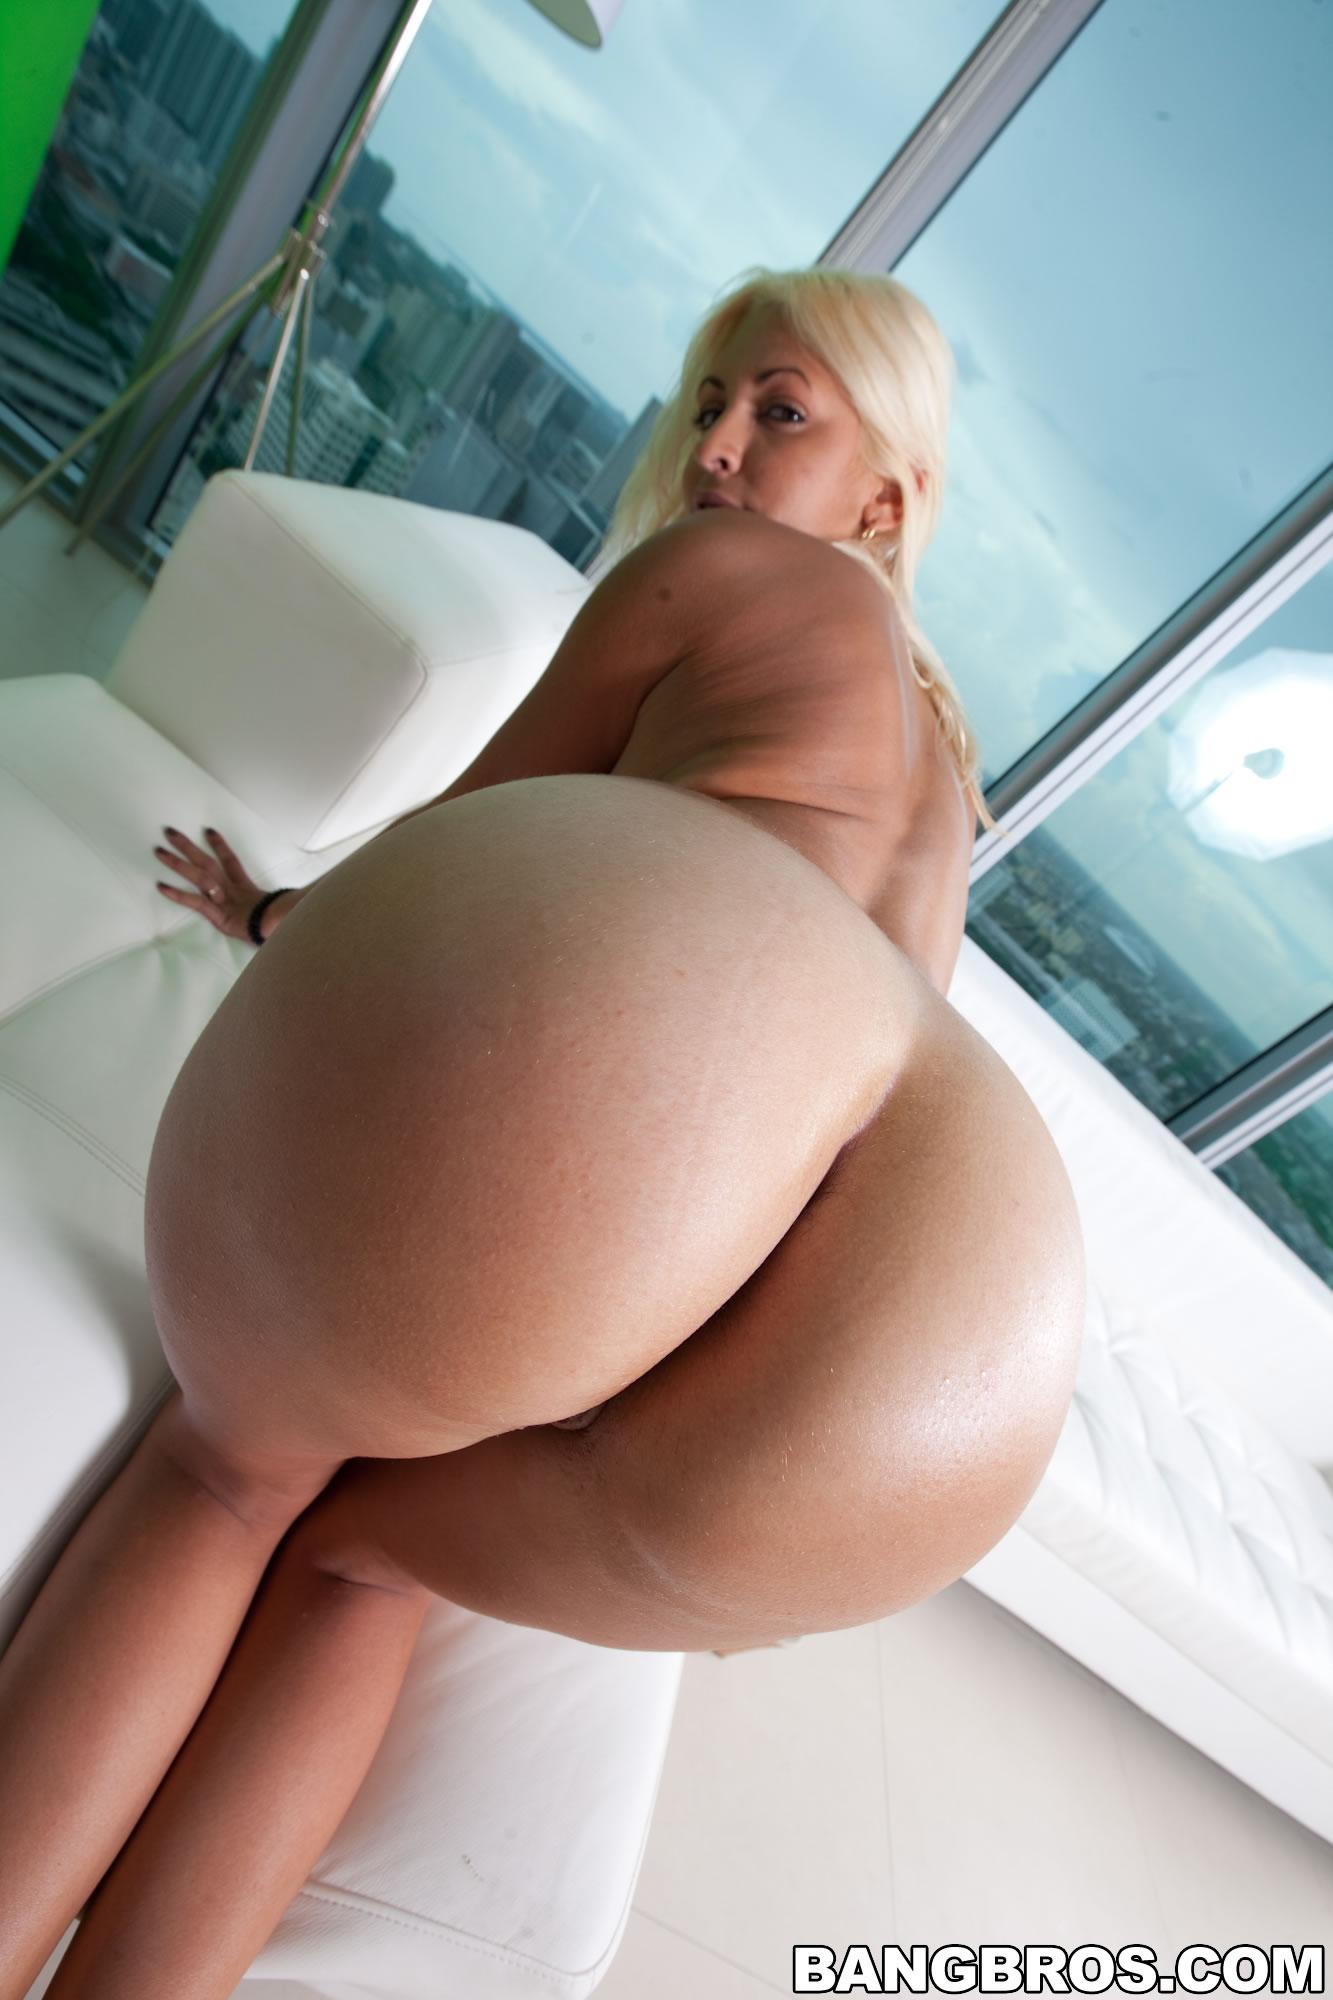 Big tits, round asses